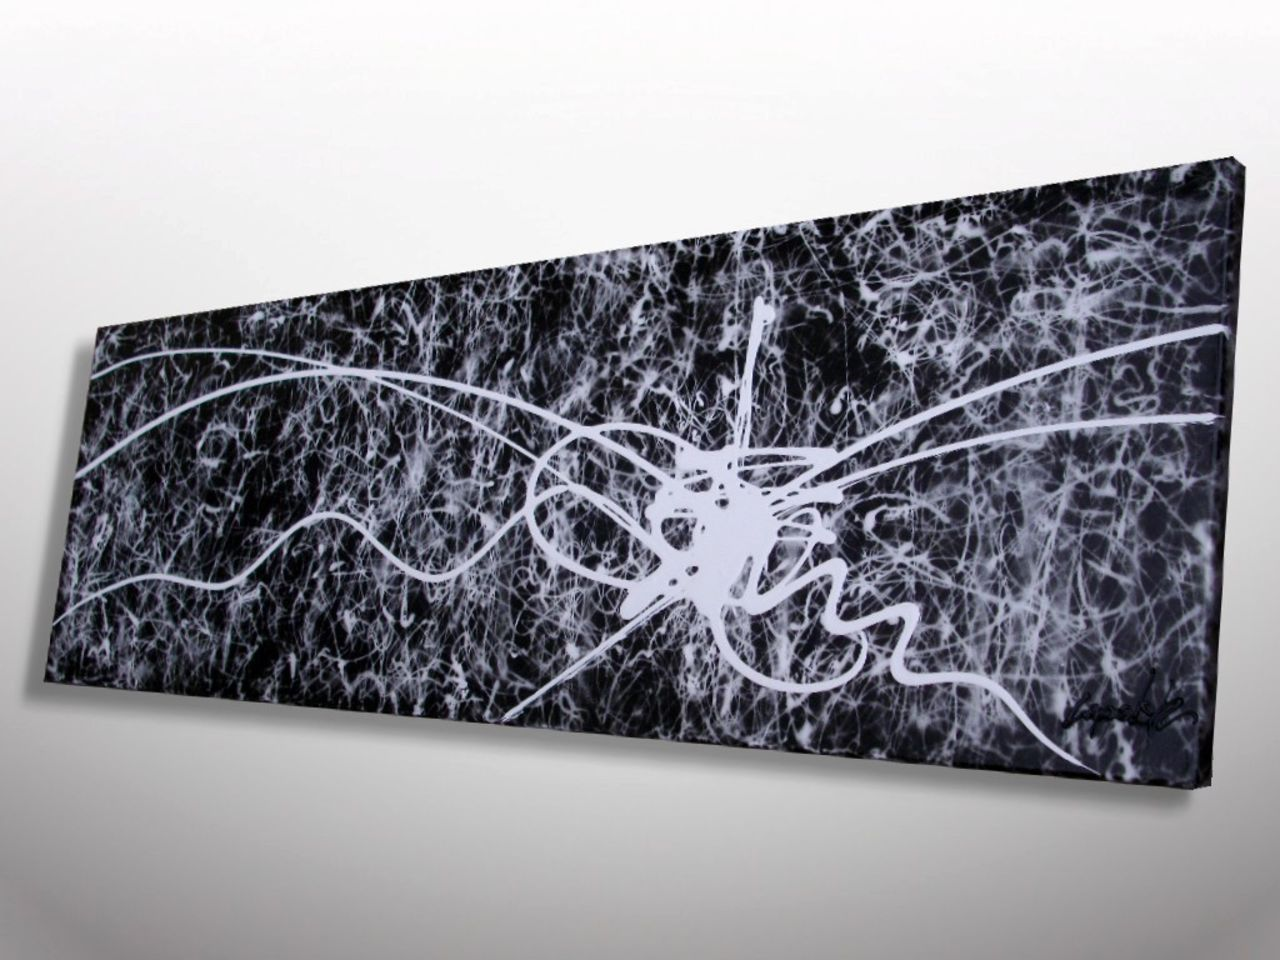 LEPOLSK MATUSZEWSKI X-RAY  Expressionnisme abstrait contemporain